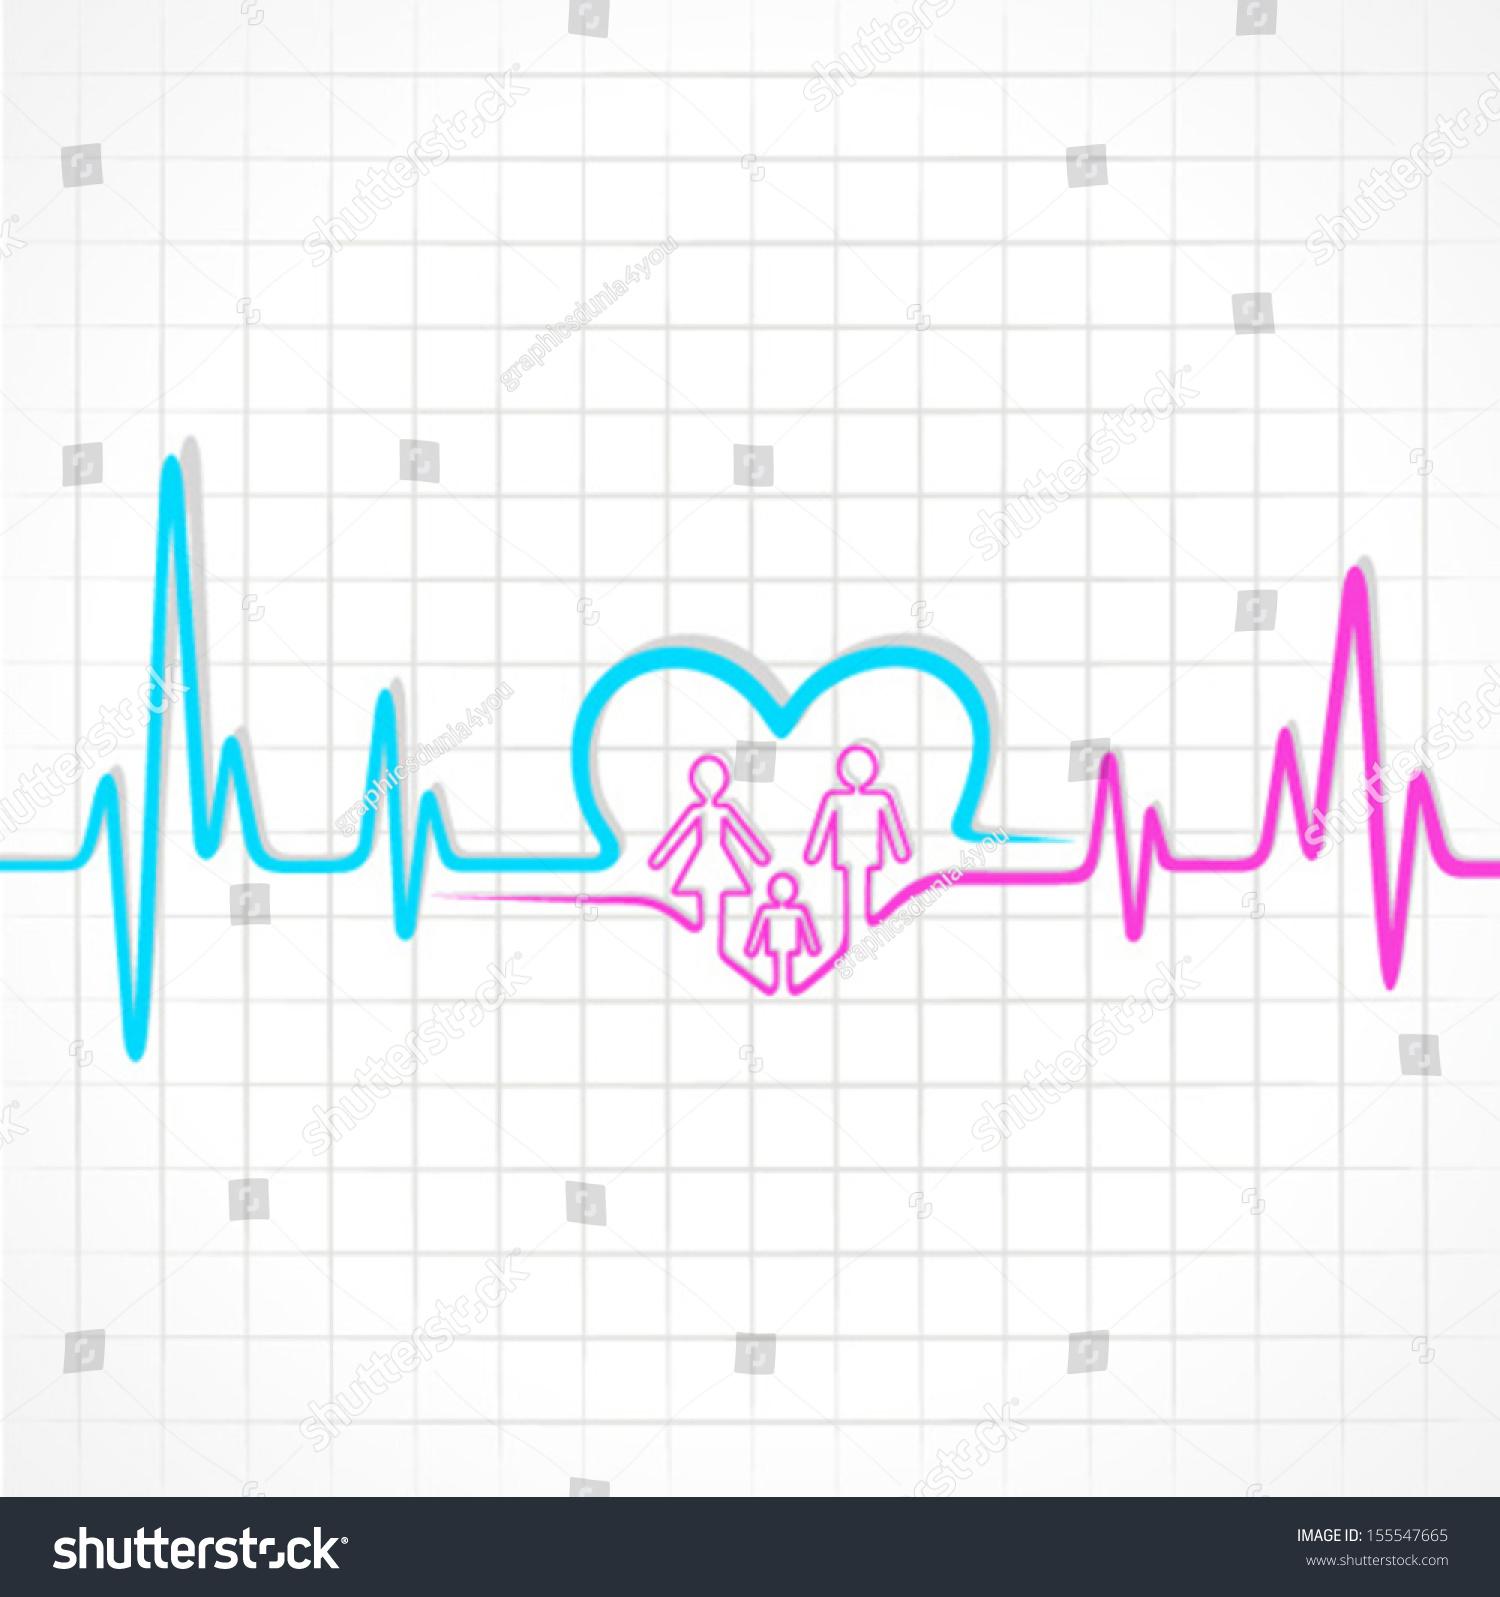 make heart symbol